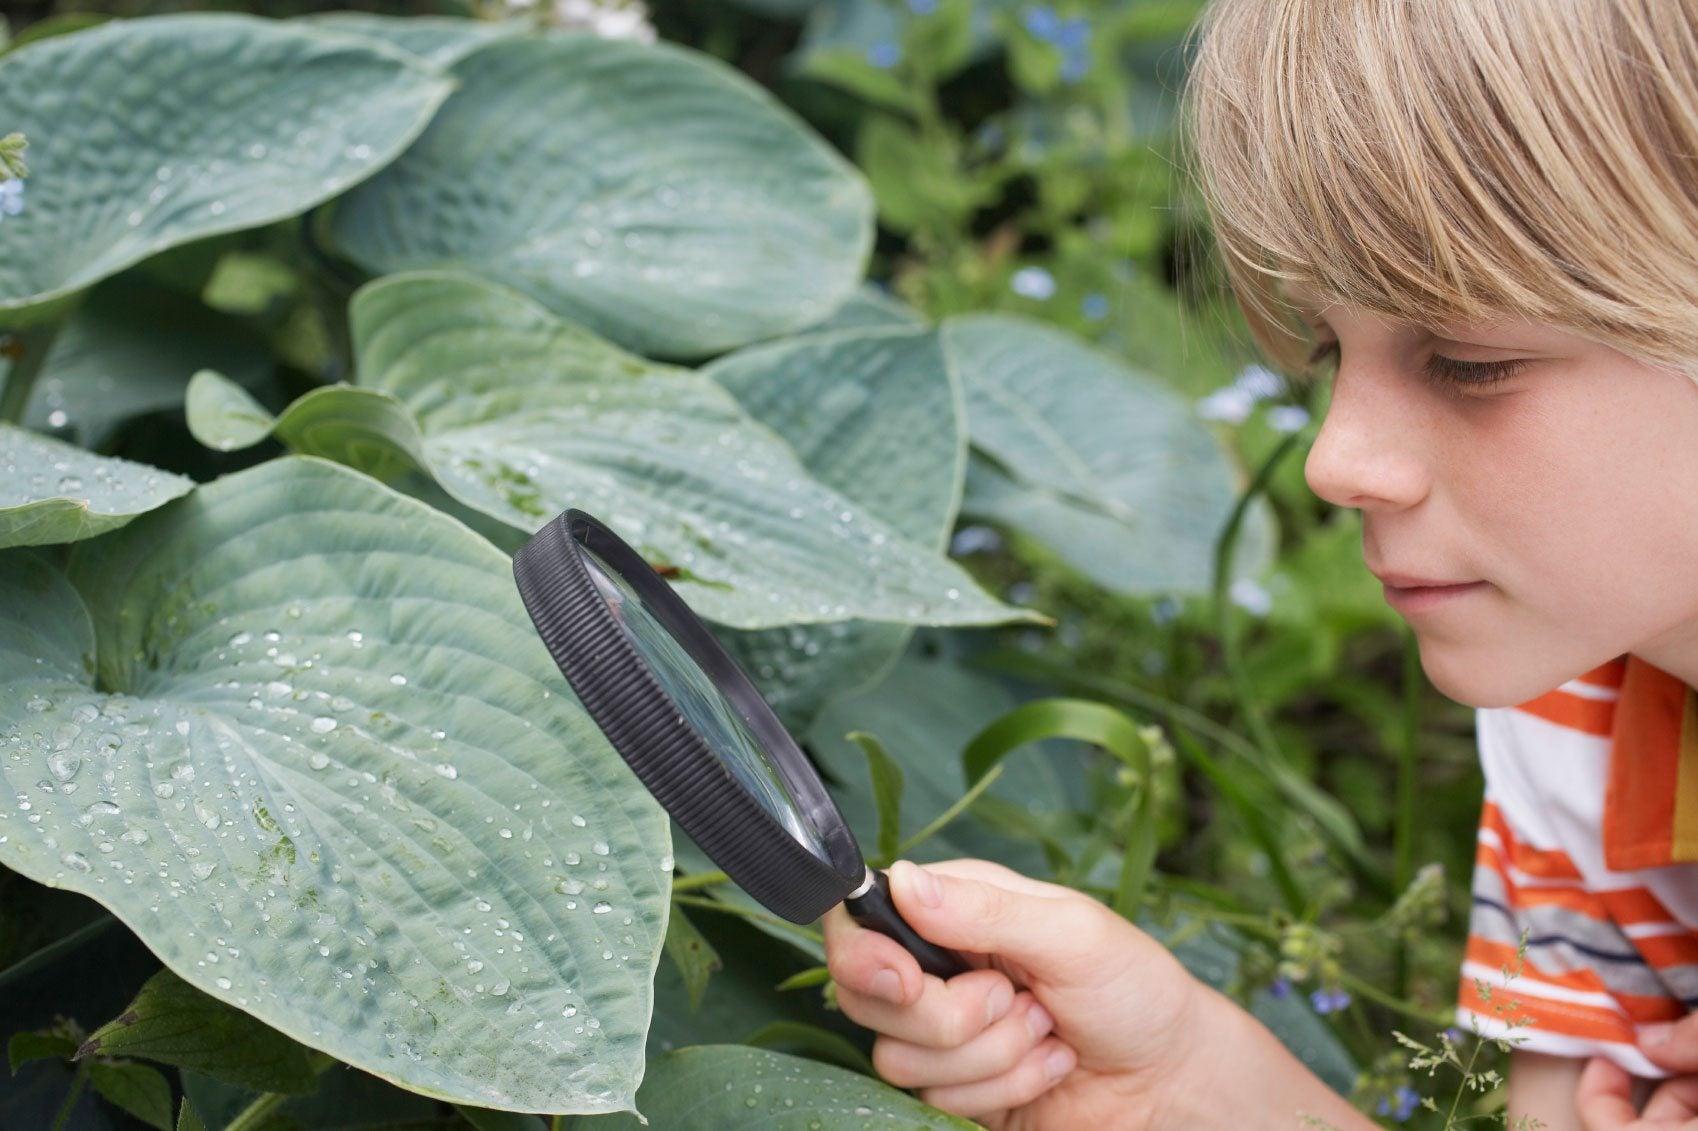 Scientific Gardening Activities - Using Gardens To Teach ...